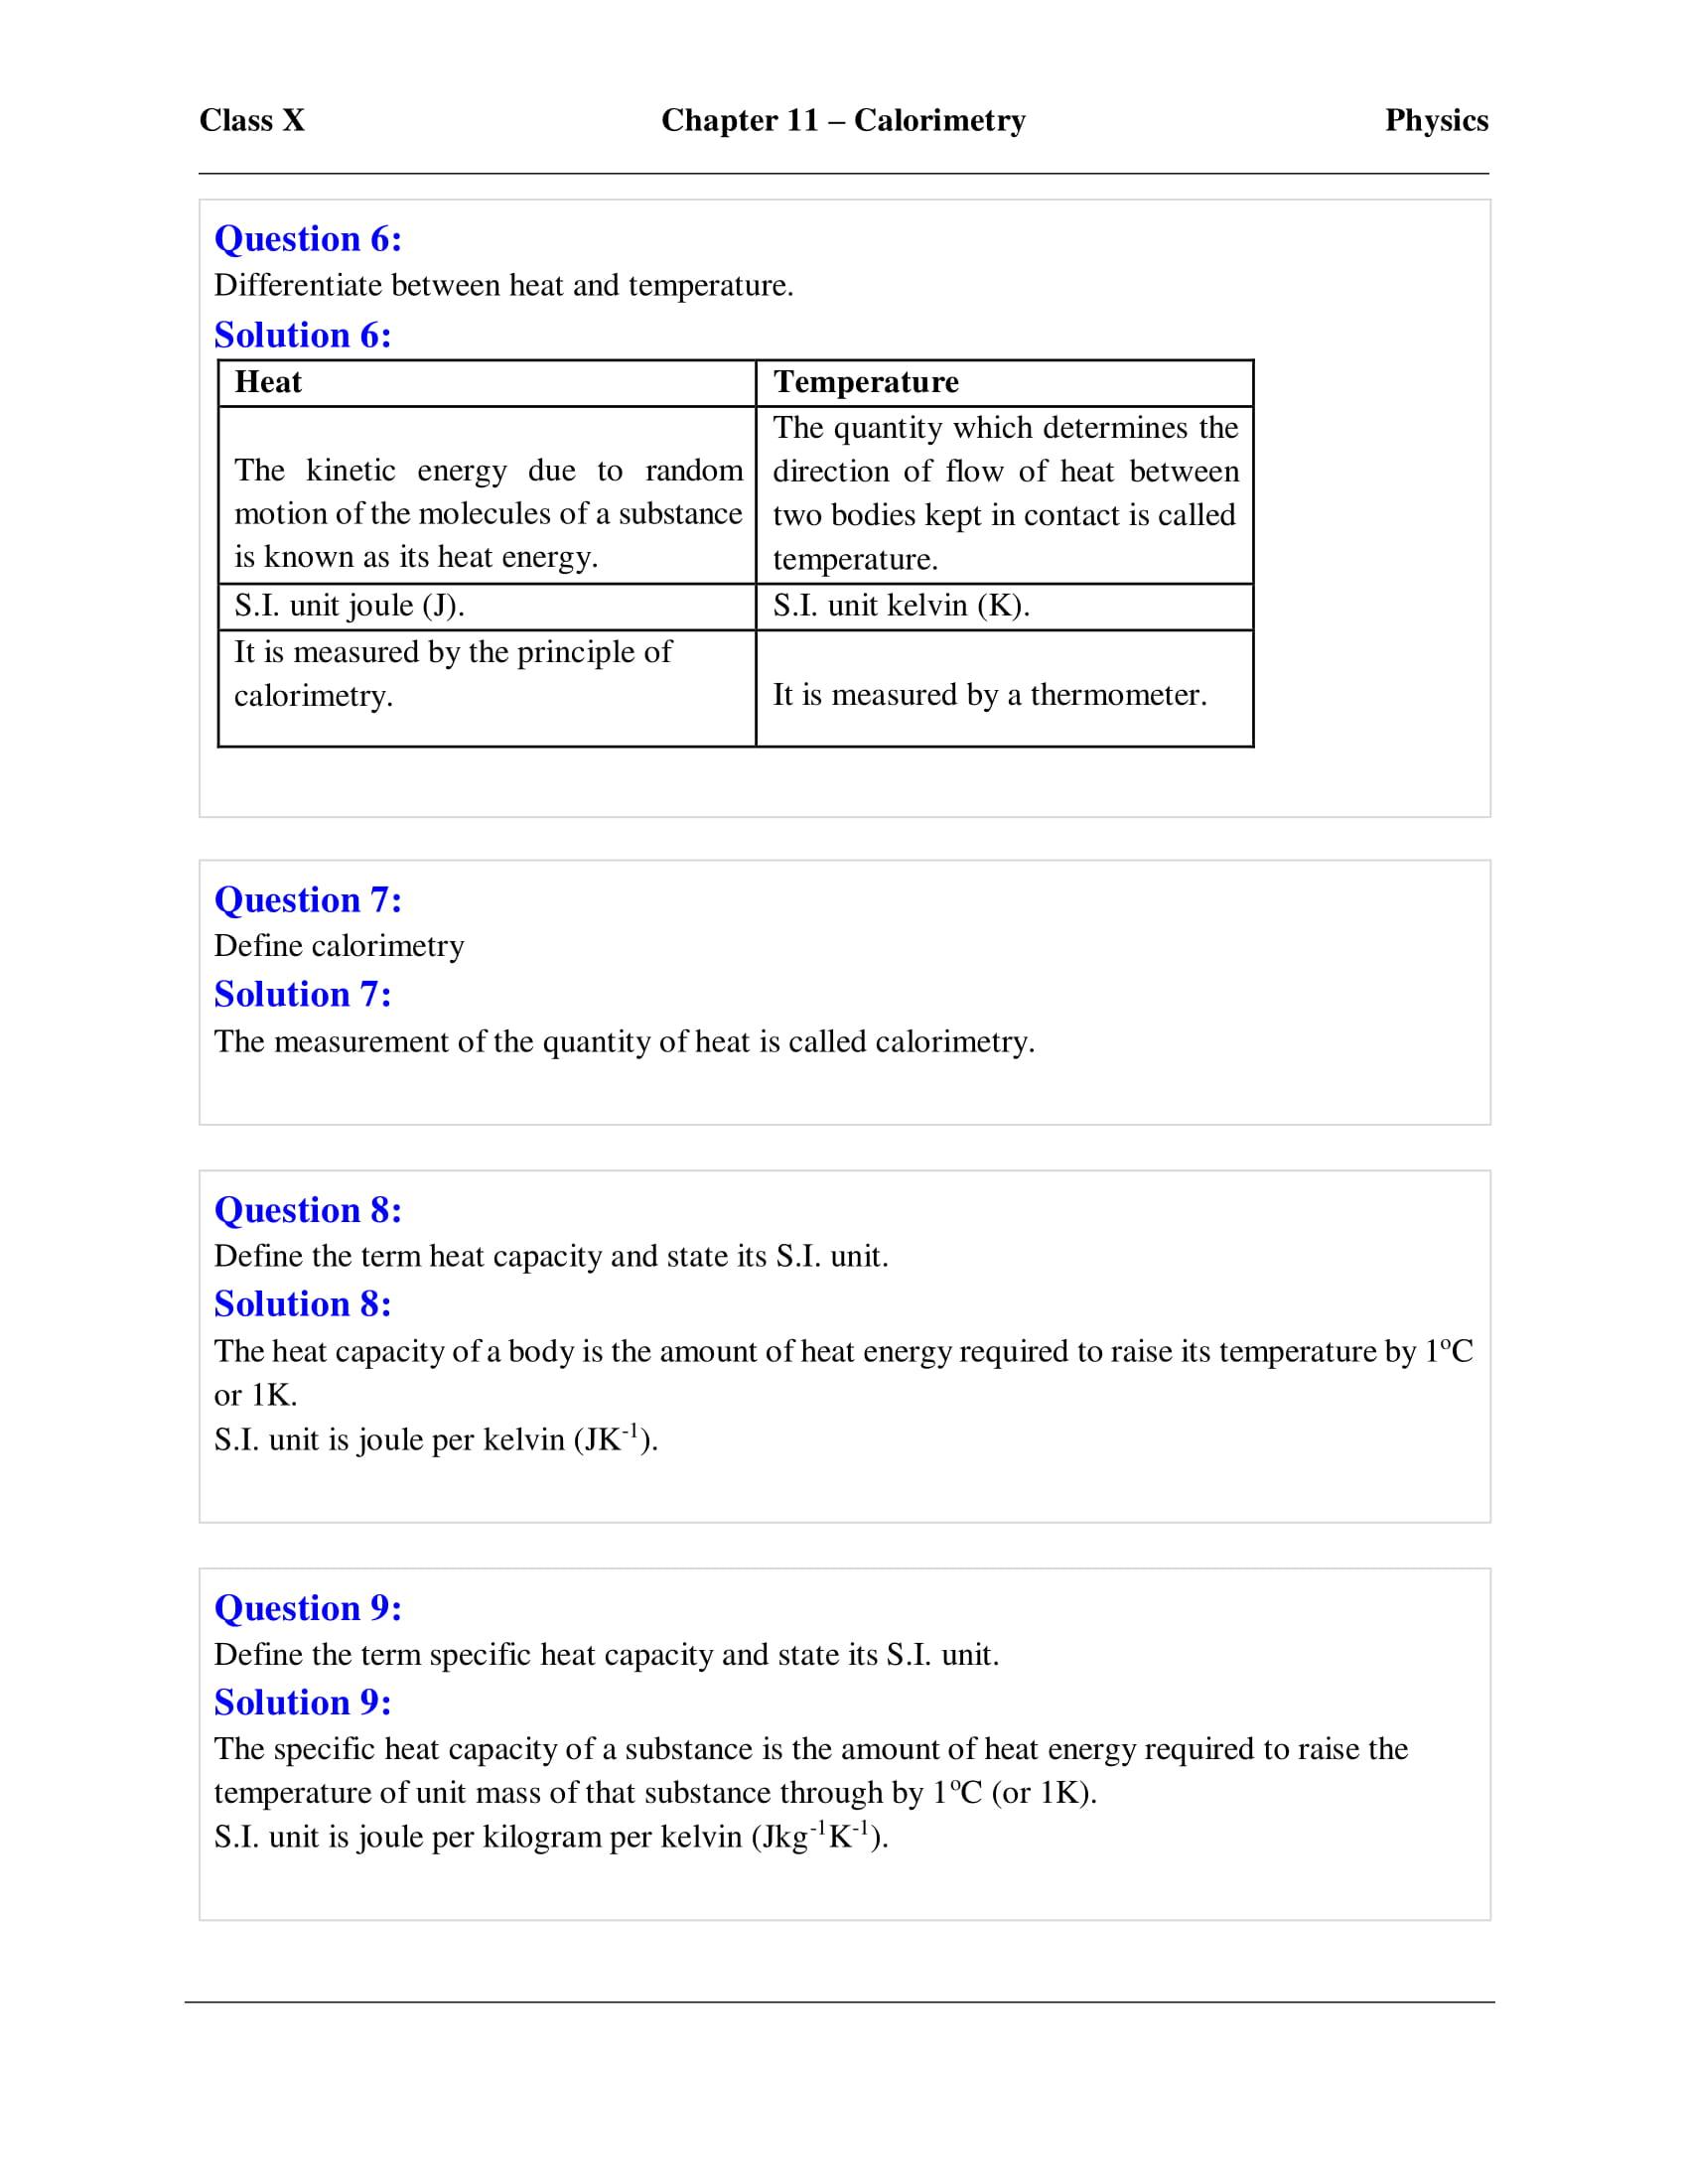 icse-selina-physics-solutions-class-10-chapter-11-calorimetry-02